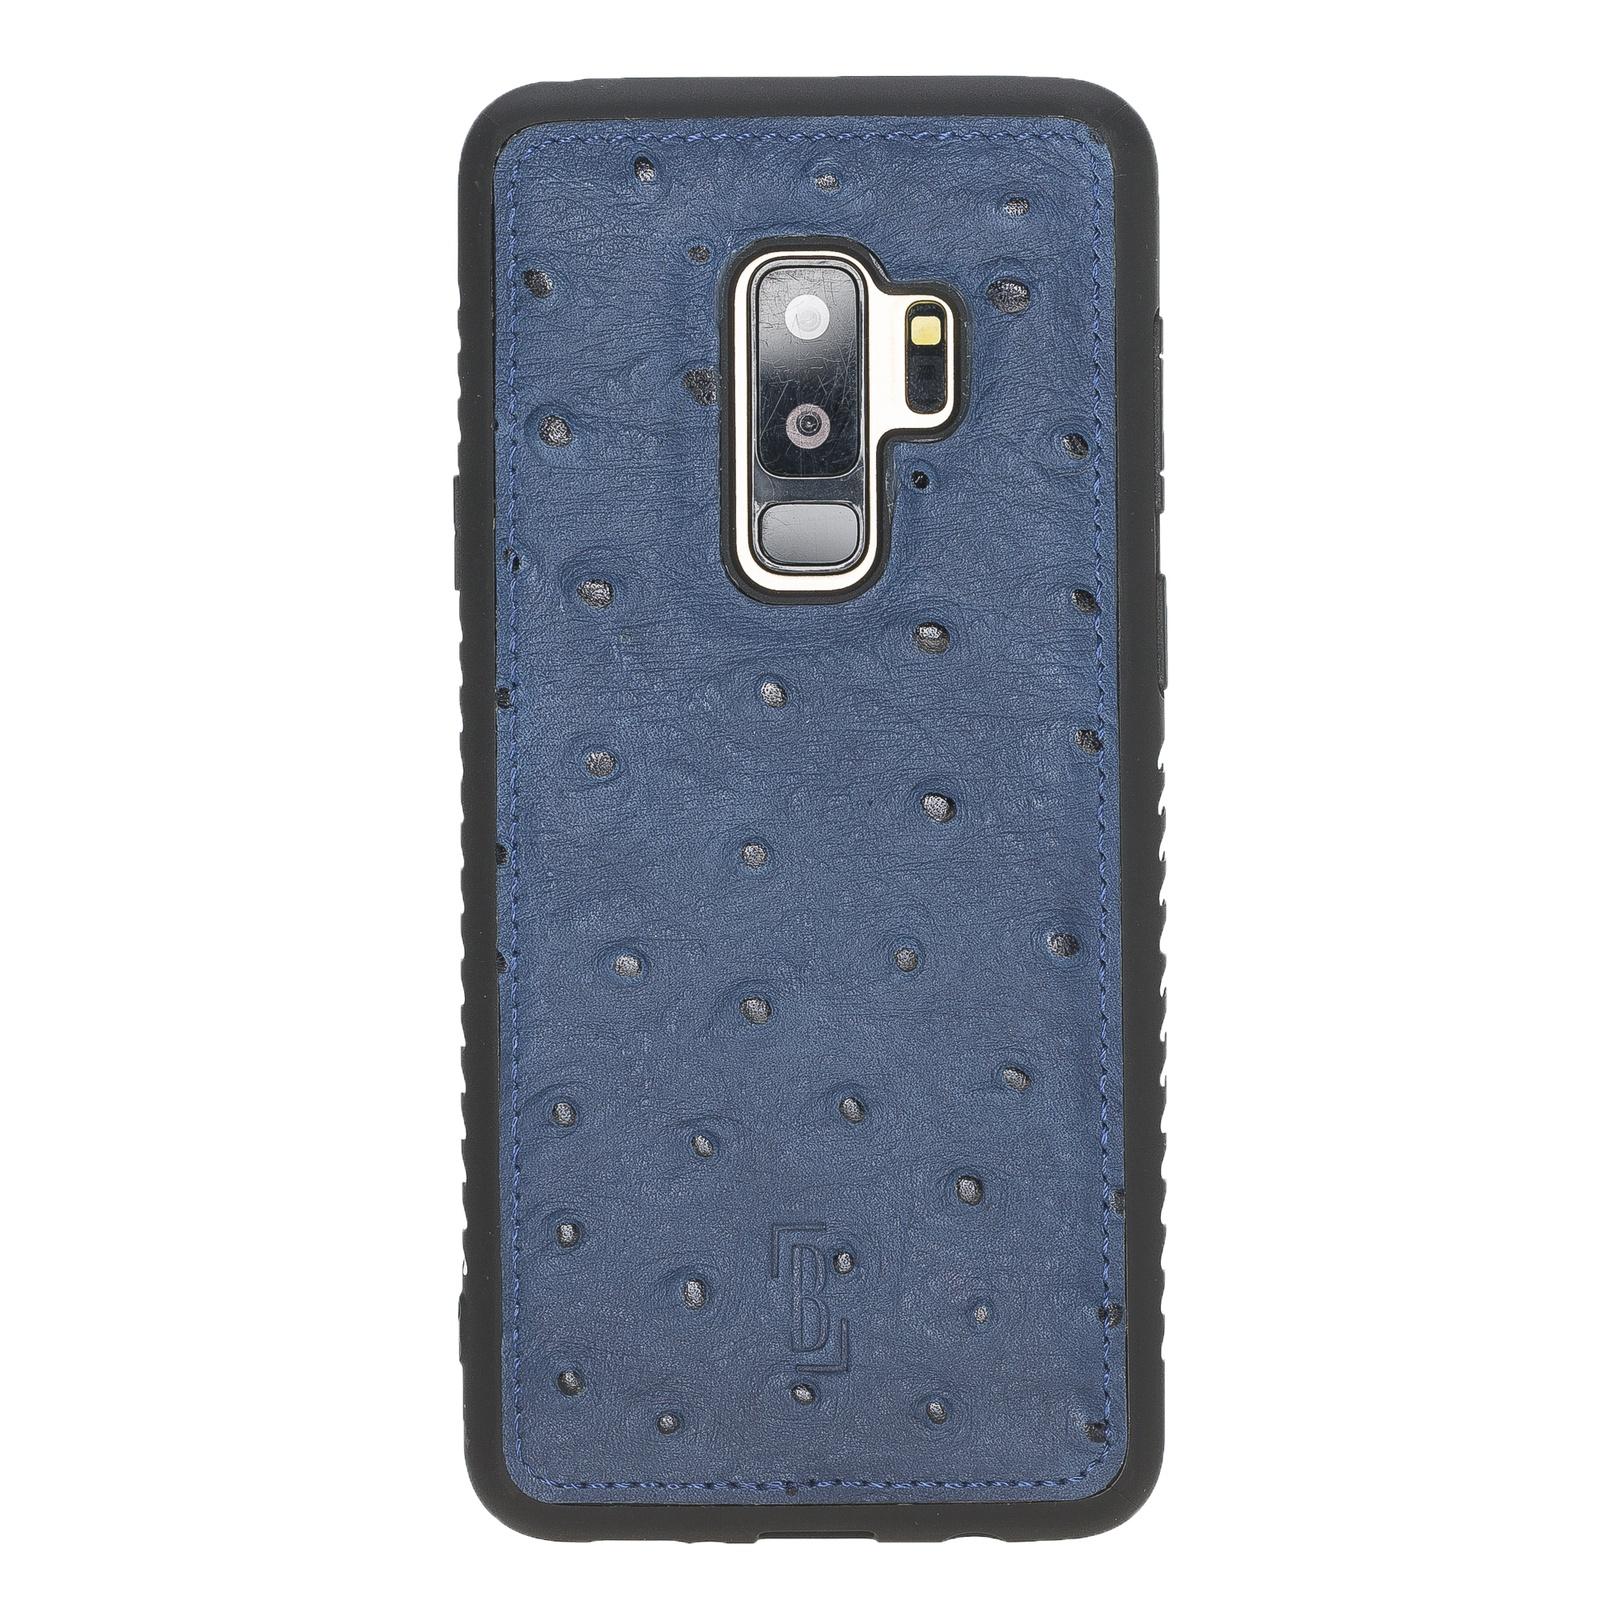 Чехол для сотового телефона Burkley для Samsung Galaxy S9 Plus FlexCover, темно-синий